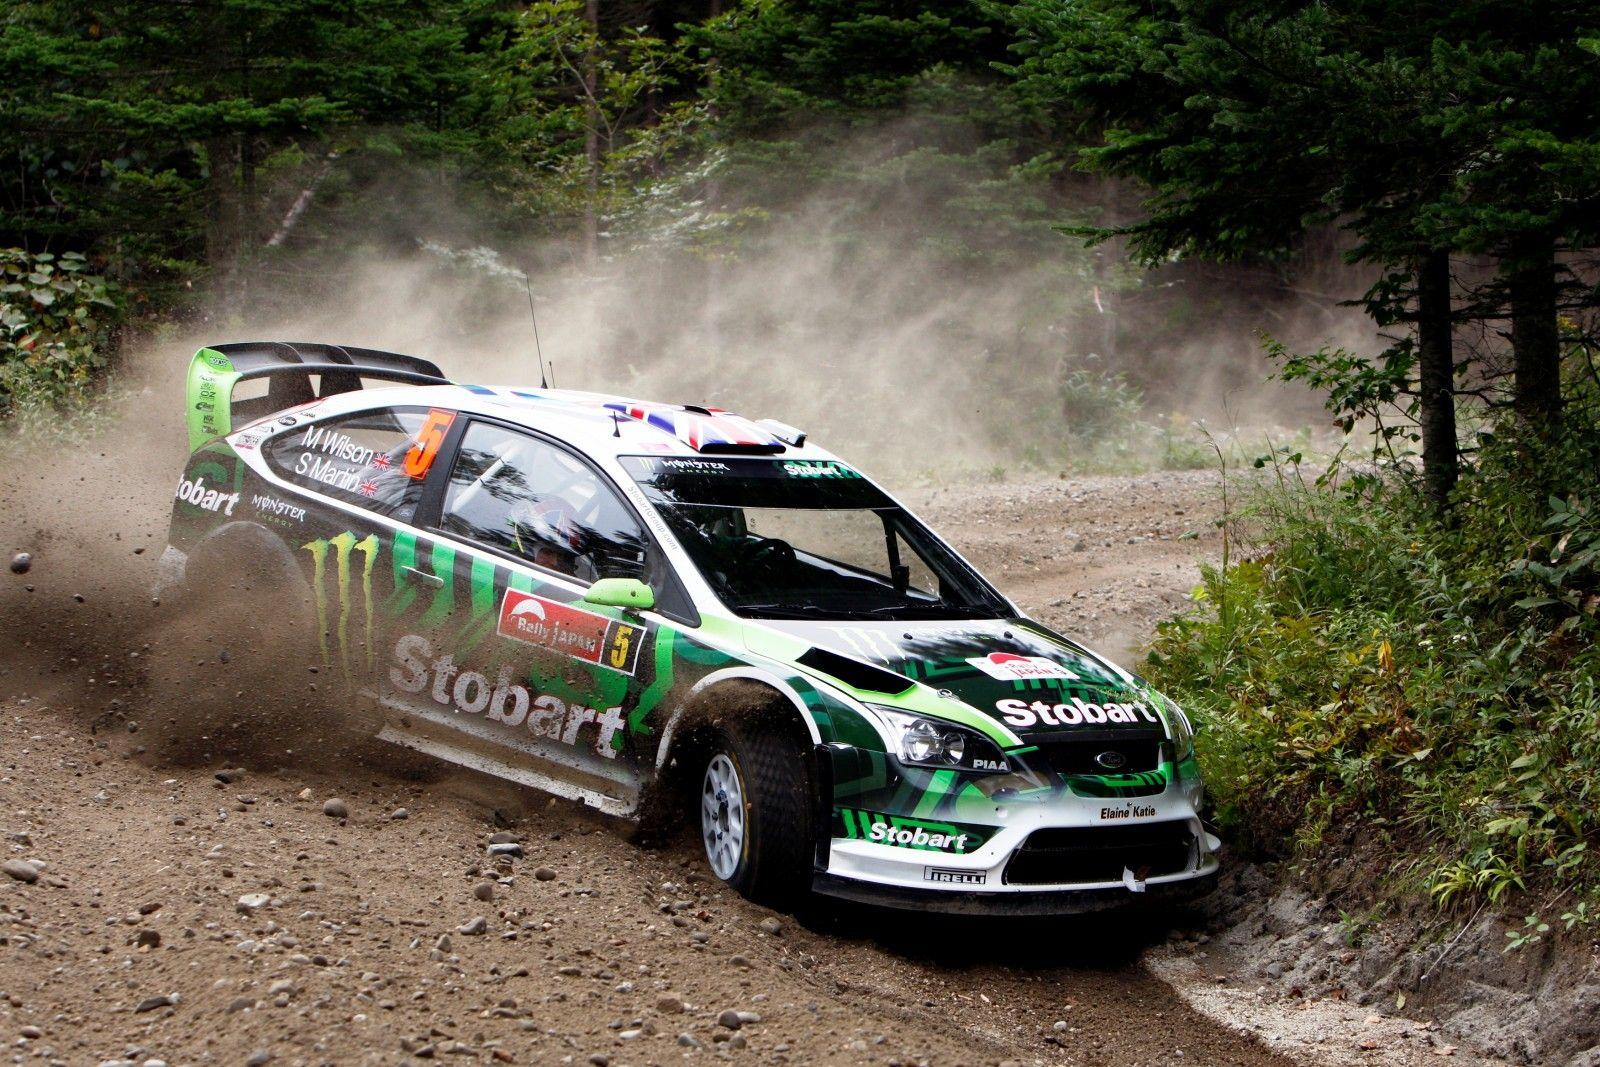 Japan Rally Hd Widescreen Wallpapers Car Rally Car Racing